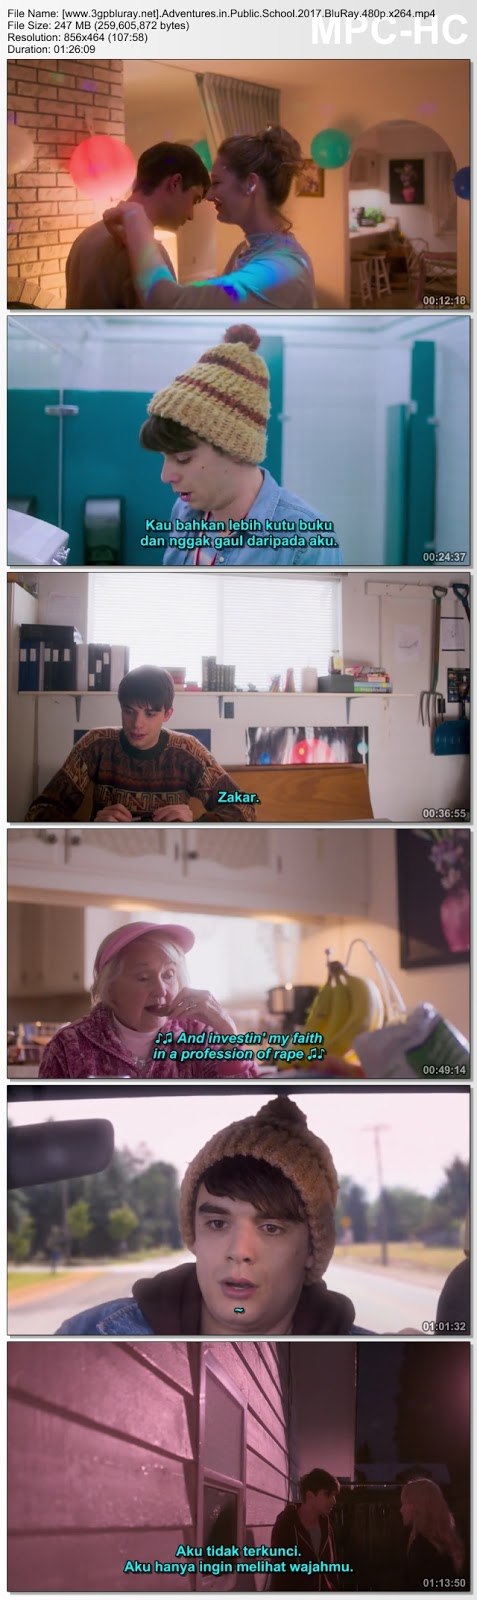 Screenshots Download Adventures in Public School (2017) BluRay 480p & 3GP Subtitle Indonesia